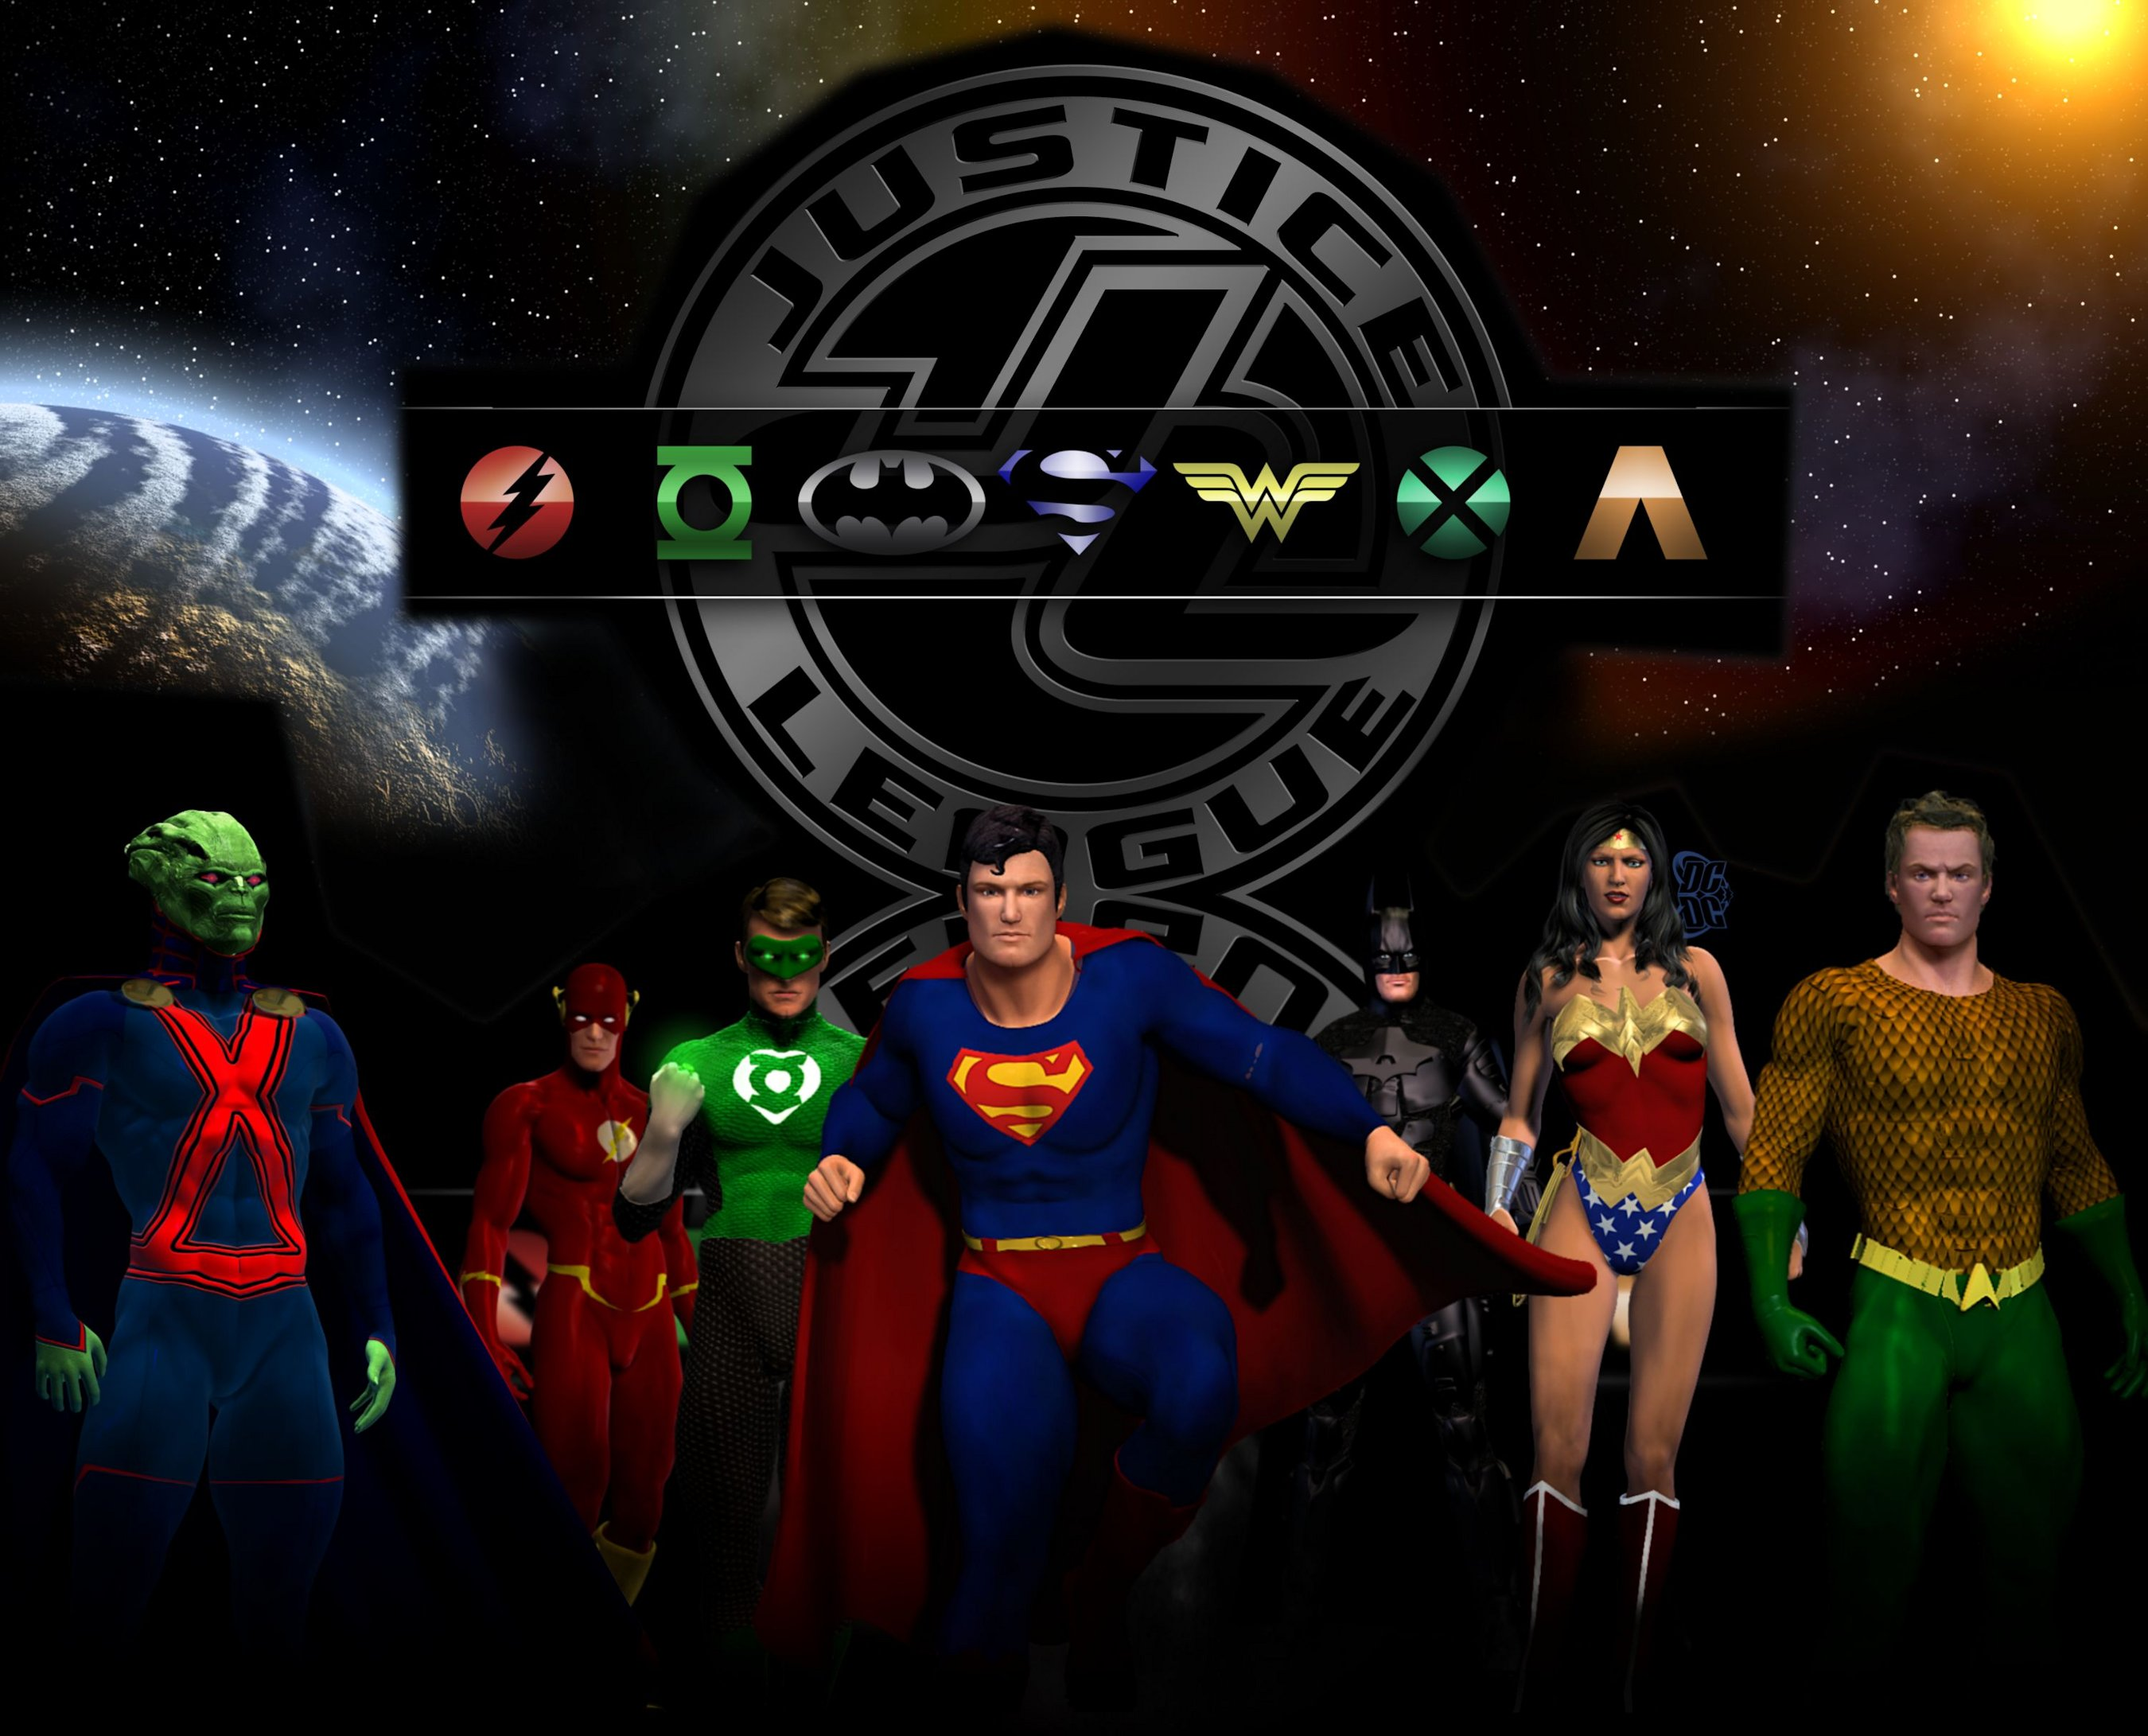 Hd wallpaper justice league - Comics Justice League Jla Dc Comics Superman Martian Manhunter Flash Green Lantern Batman Wonder Woman